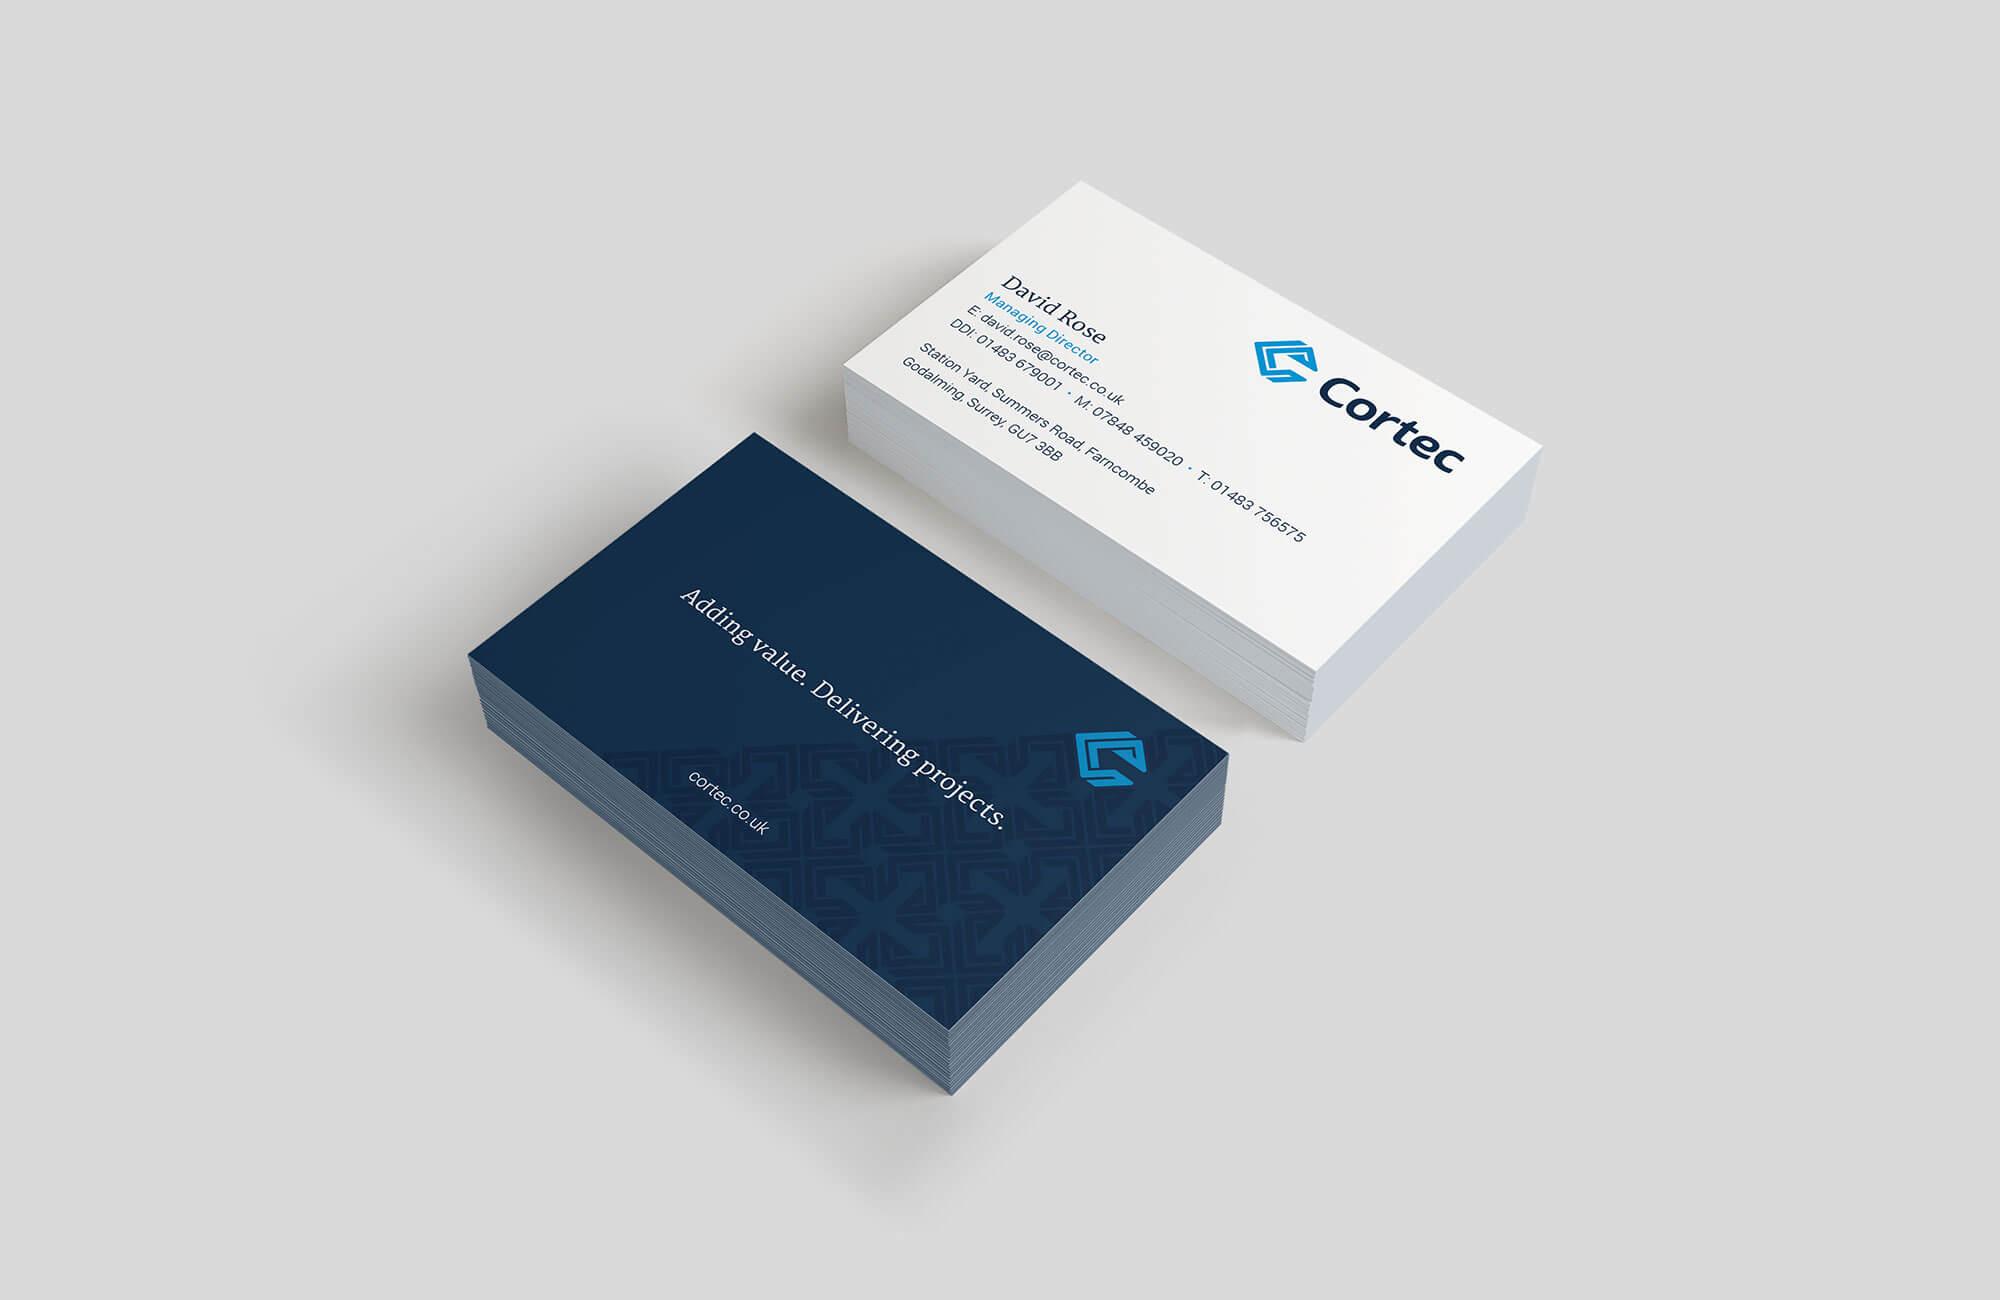 Cortec Business Cards